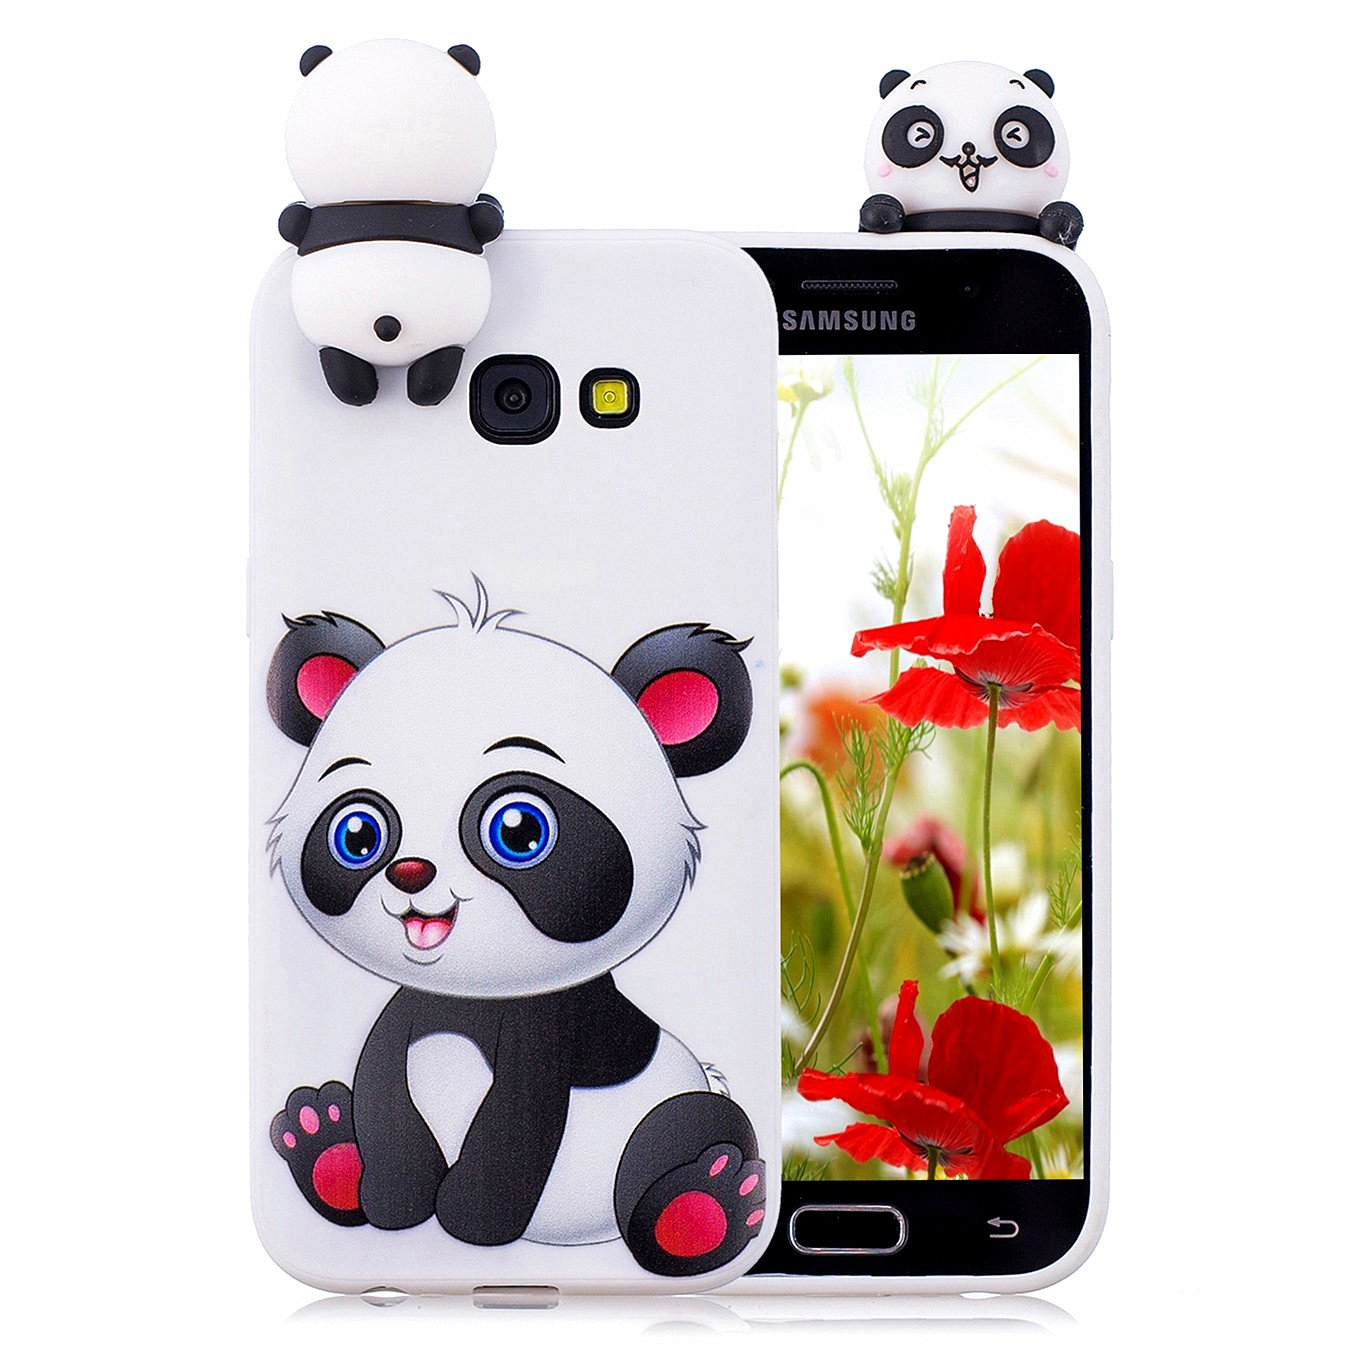 Panda Adorabile